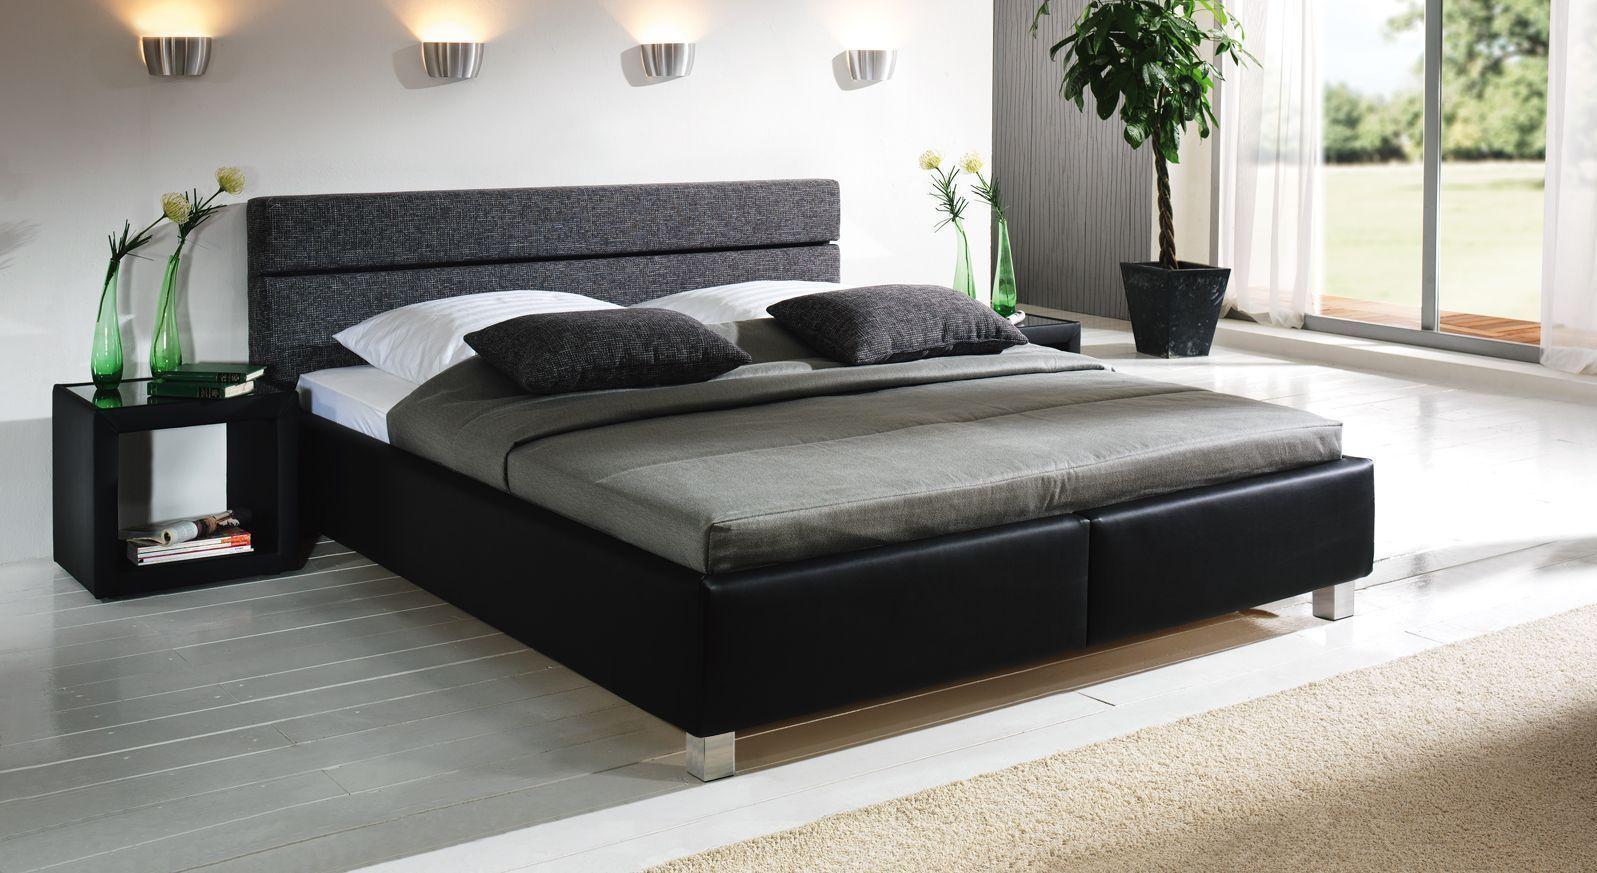 Bett Sanremo modern 9cm Füße